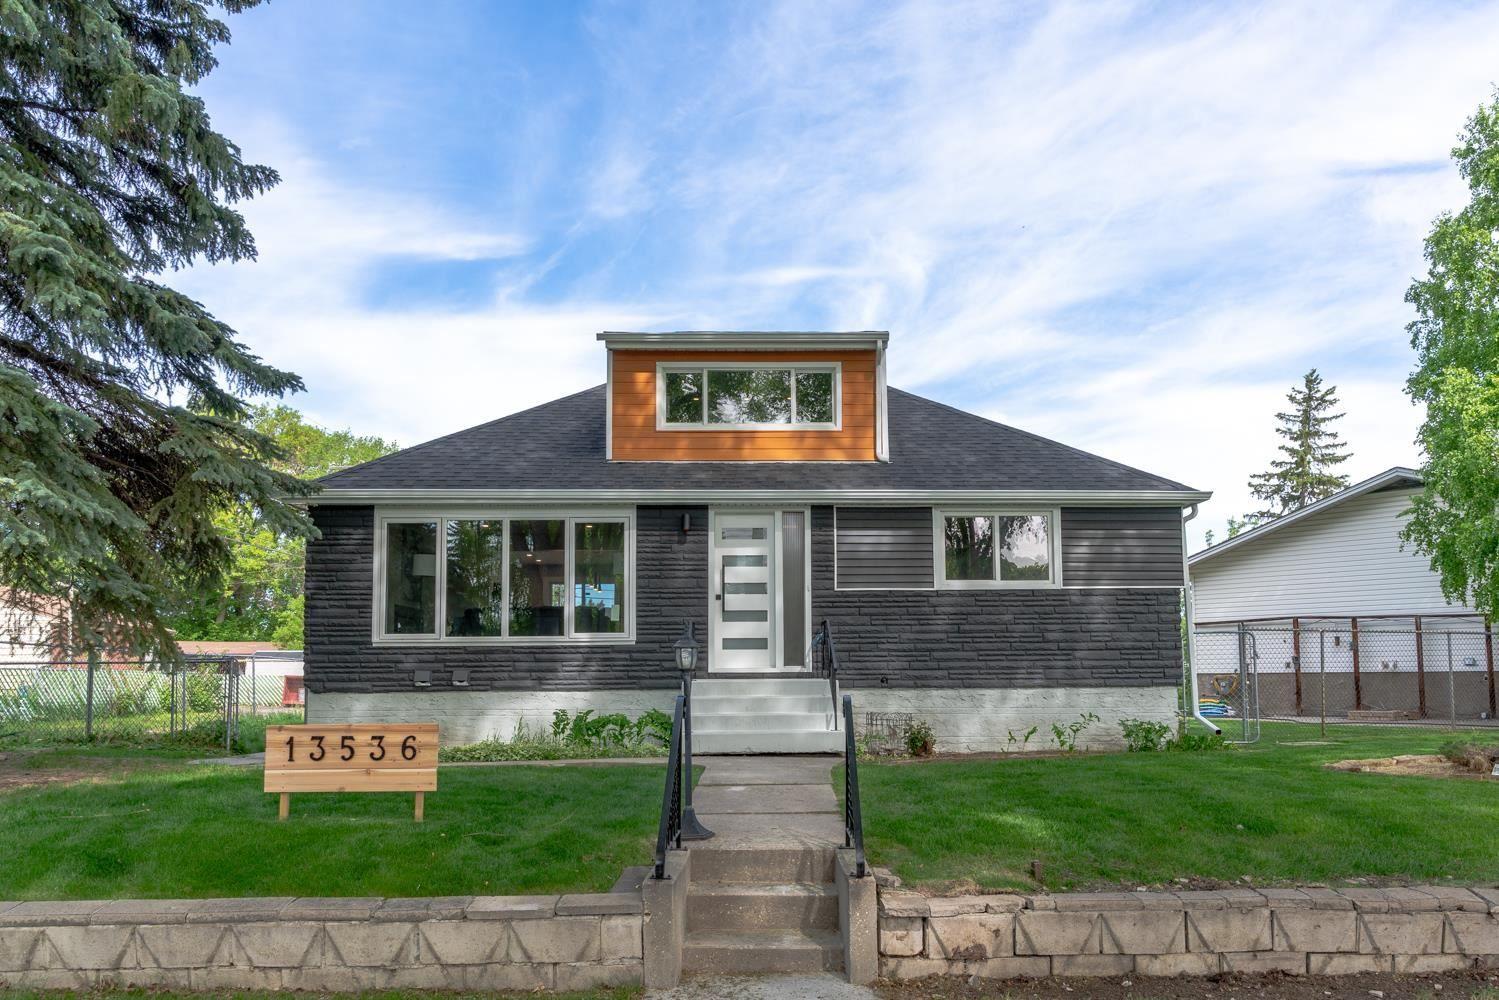 Main Photo: 13536 117 Avenue in Edmonton: Zone 07 House for sale : MLS®# E4247509